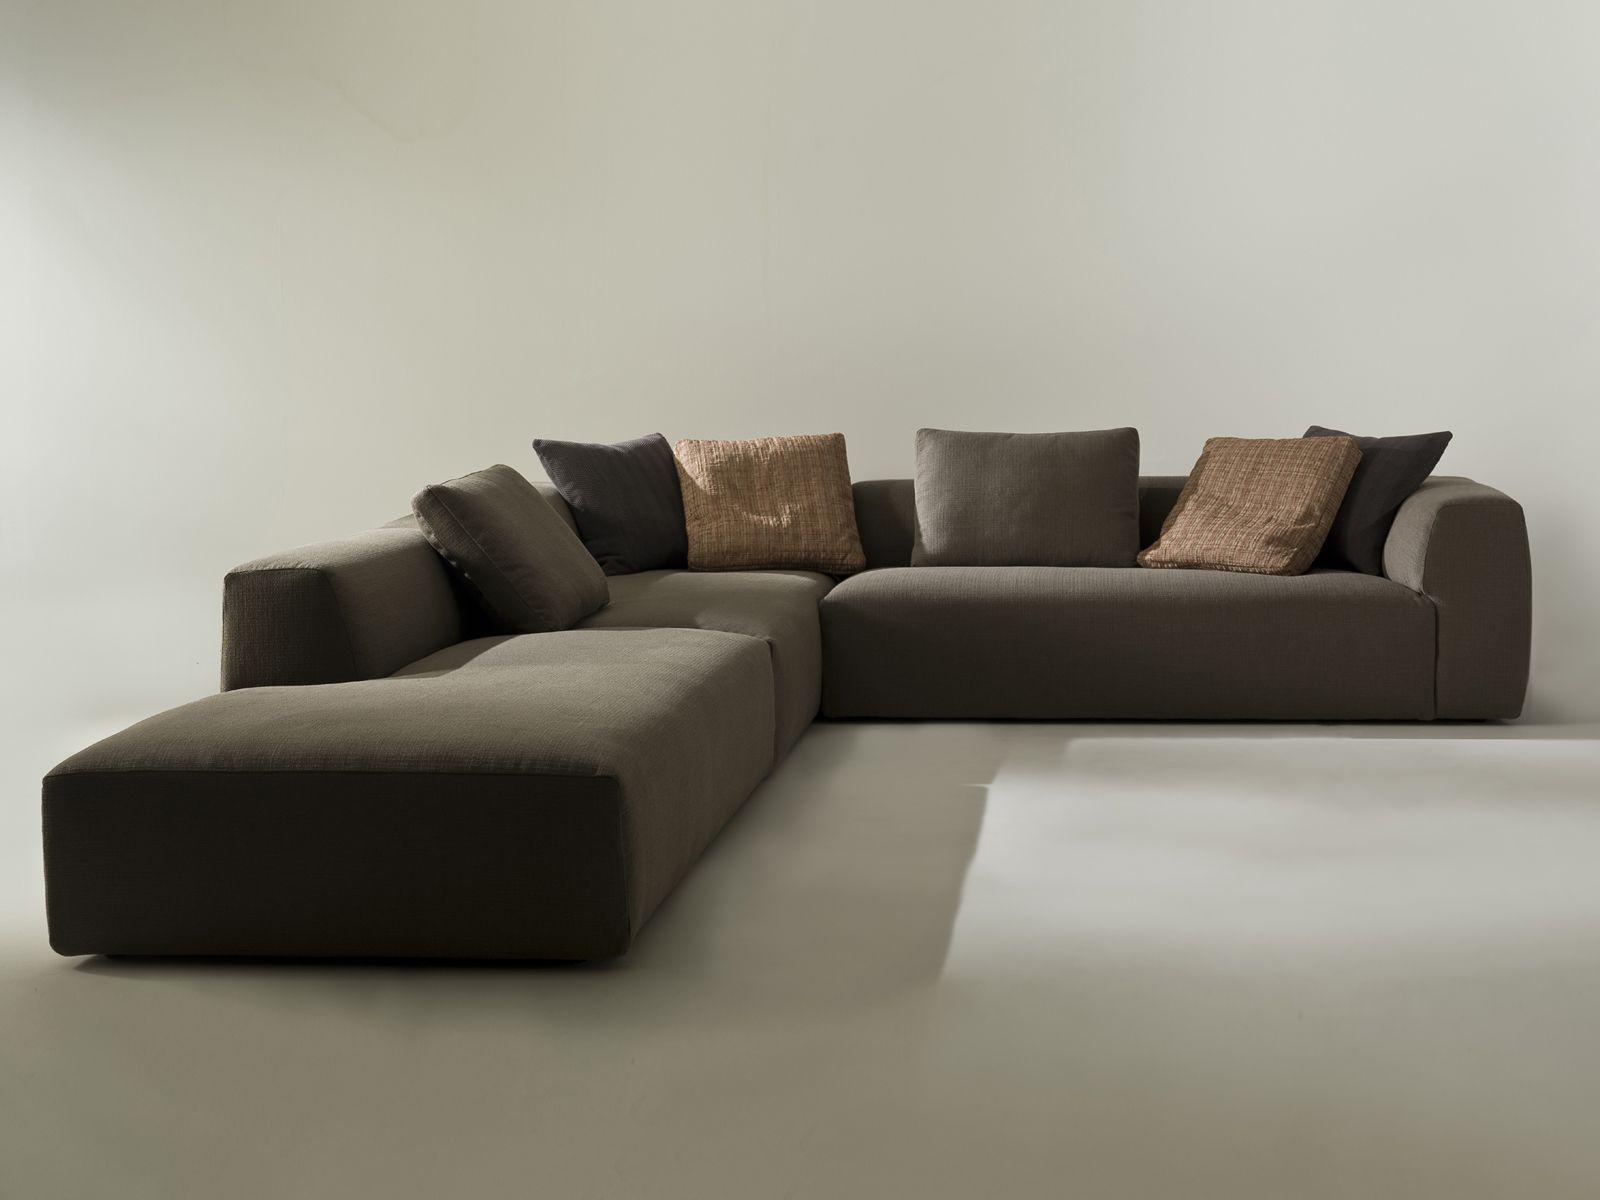 Image O: Sectional corner sofa KLUB Corner sofa i 4 Mariani